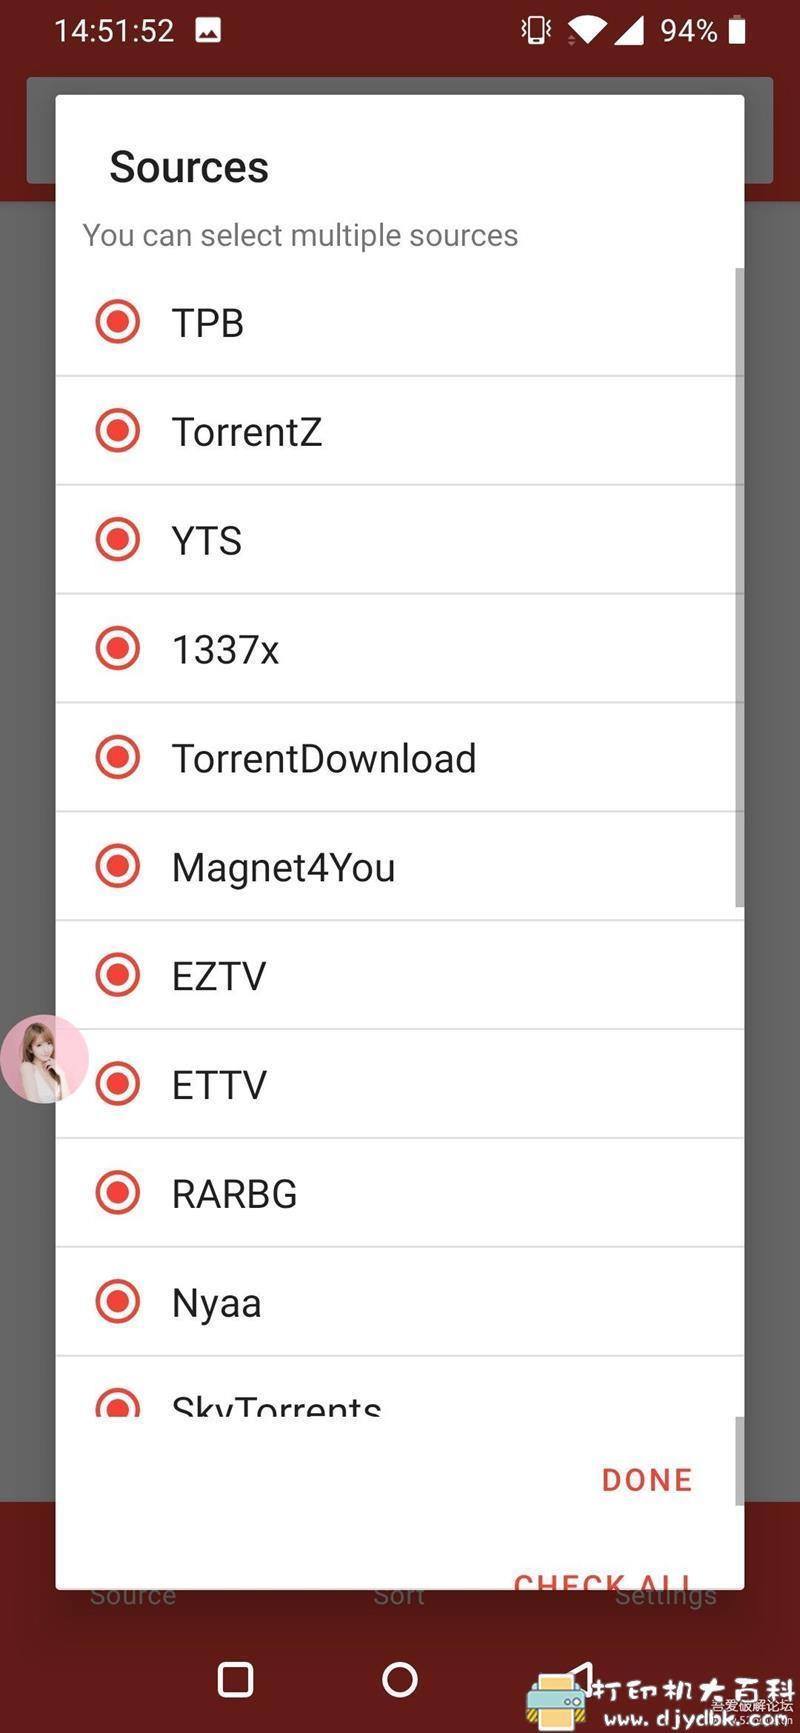 [Android]超强磁力搜索工具 Torrent Revolution – Search Engine_1.0.4 升级版 配图 No.2